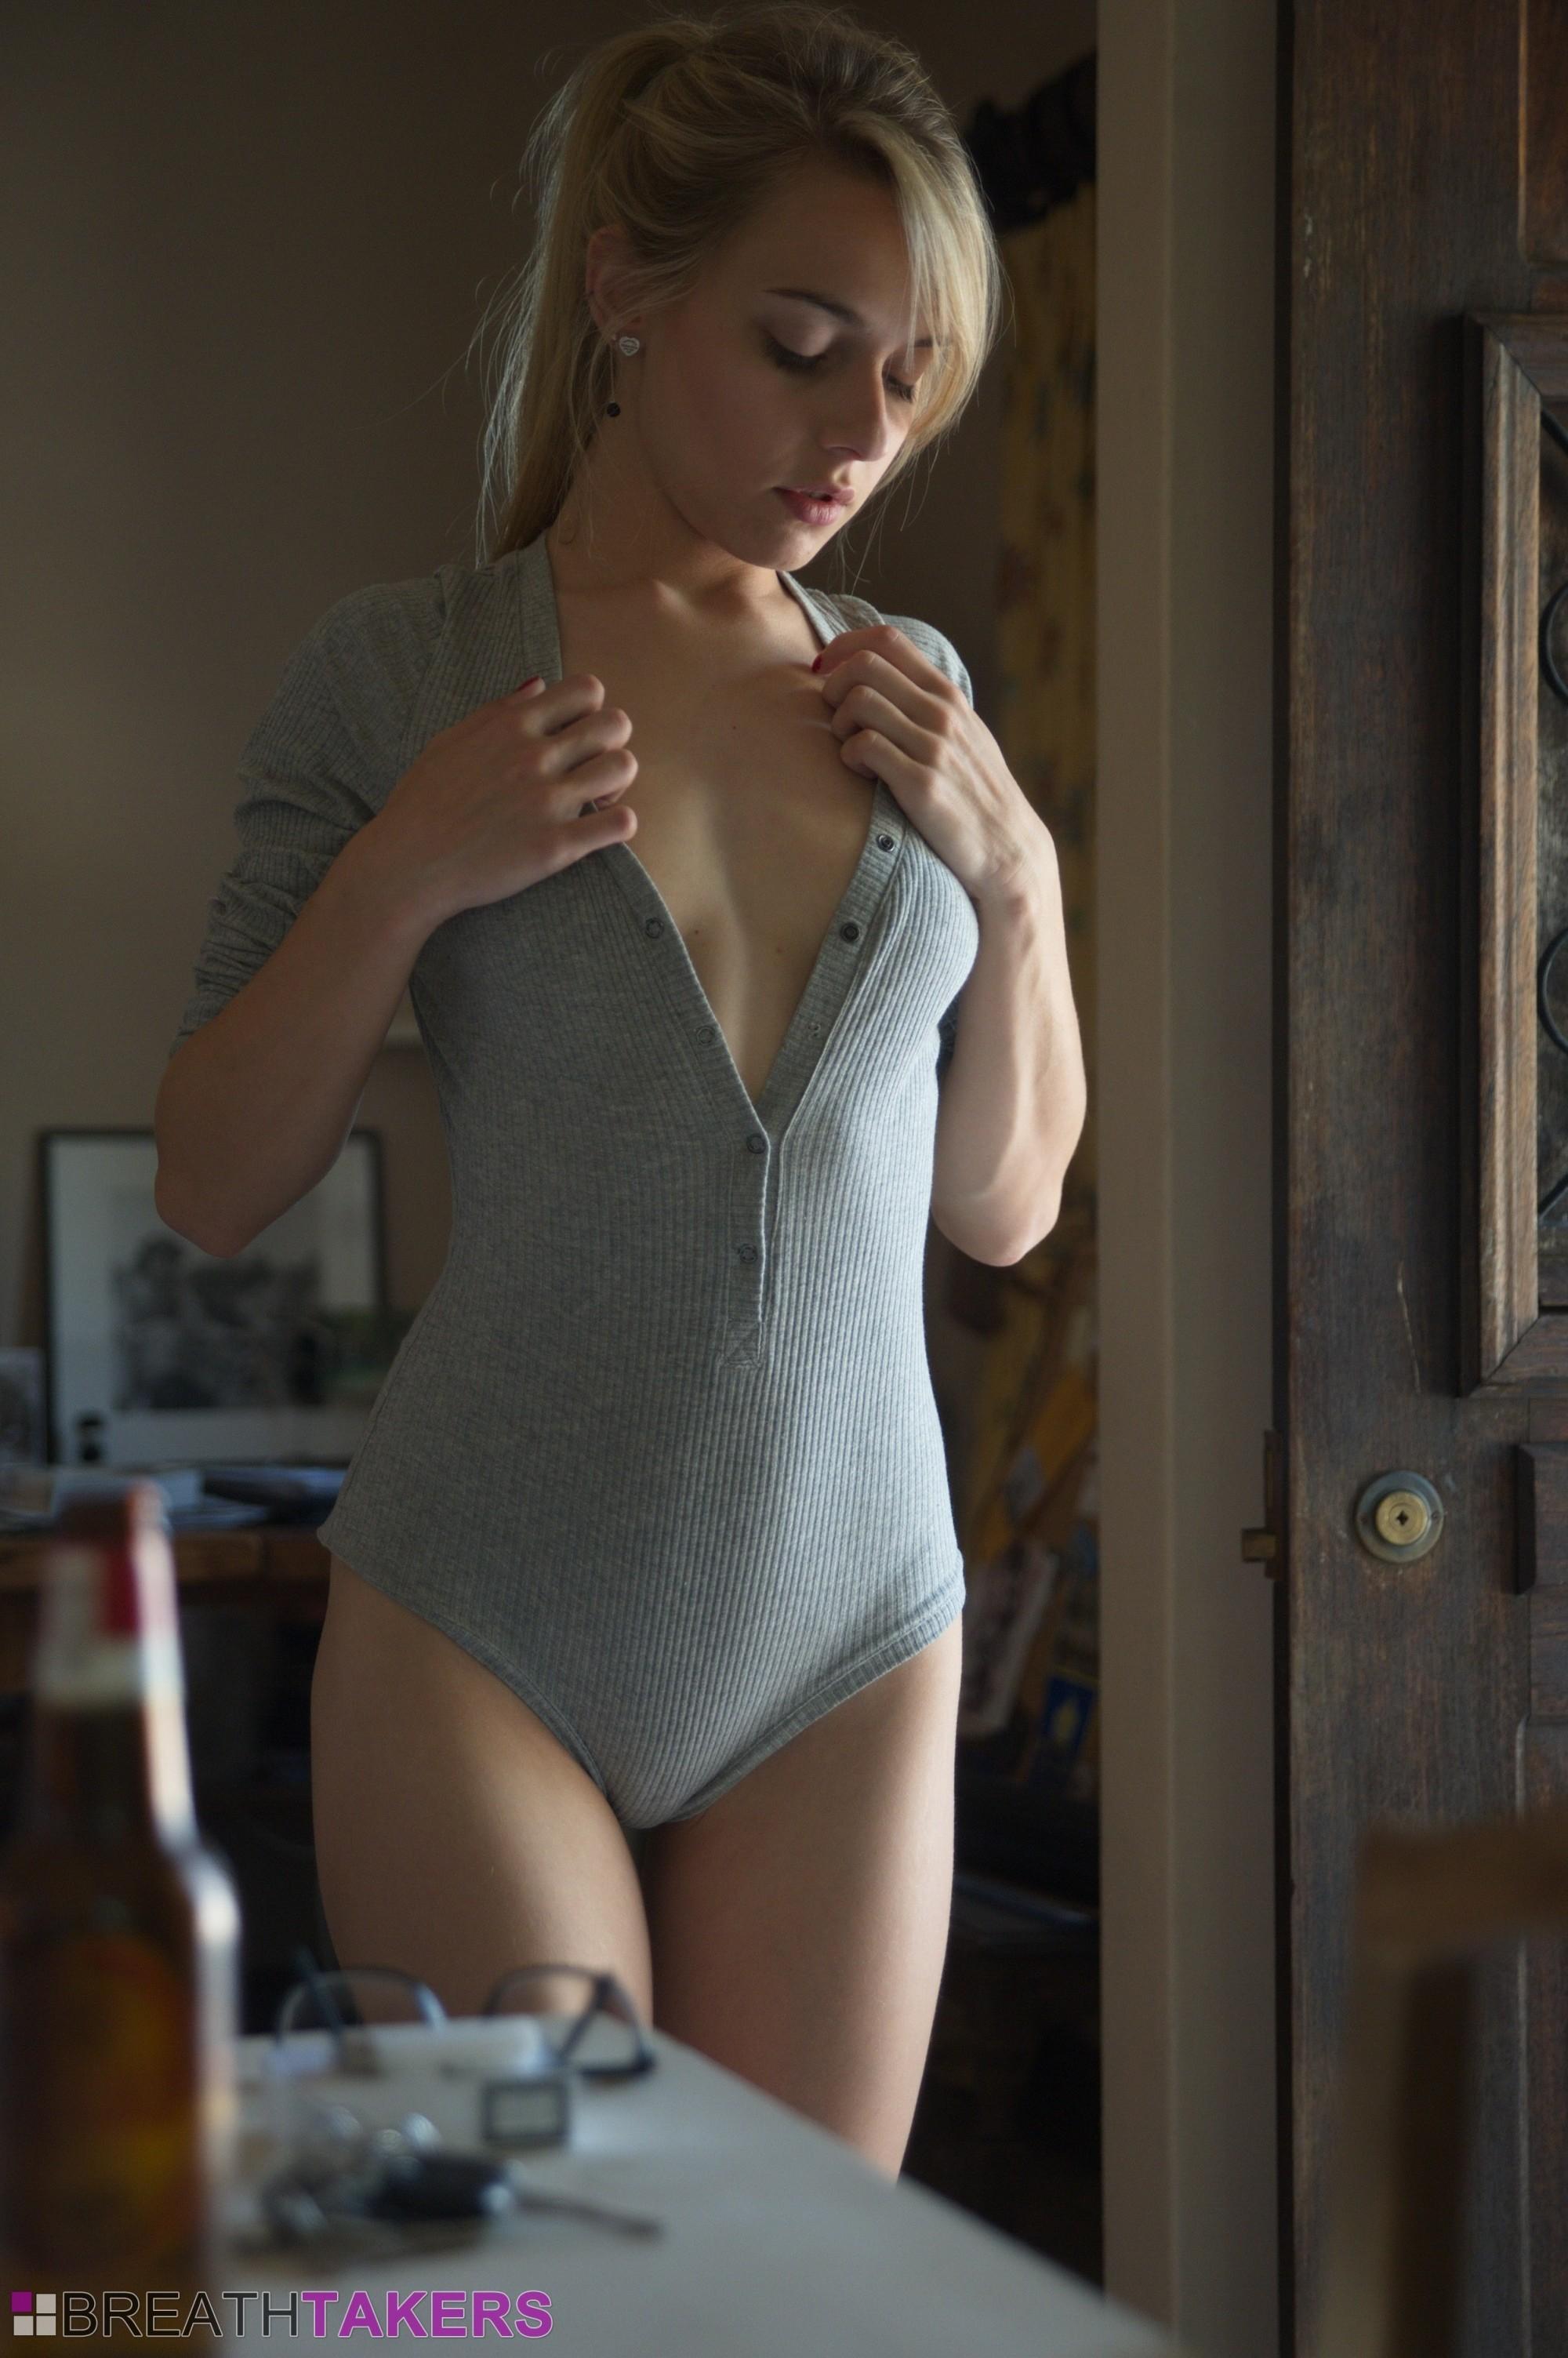 Chloe Toy - Blonde - Breathtakers 118058-7423